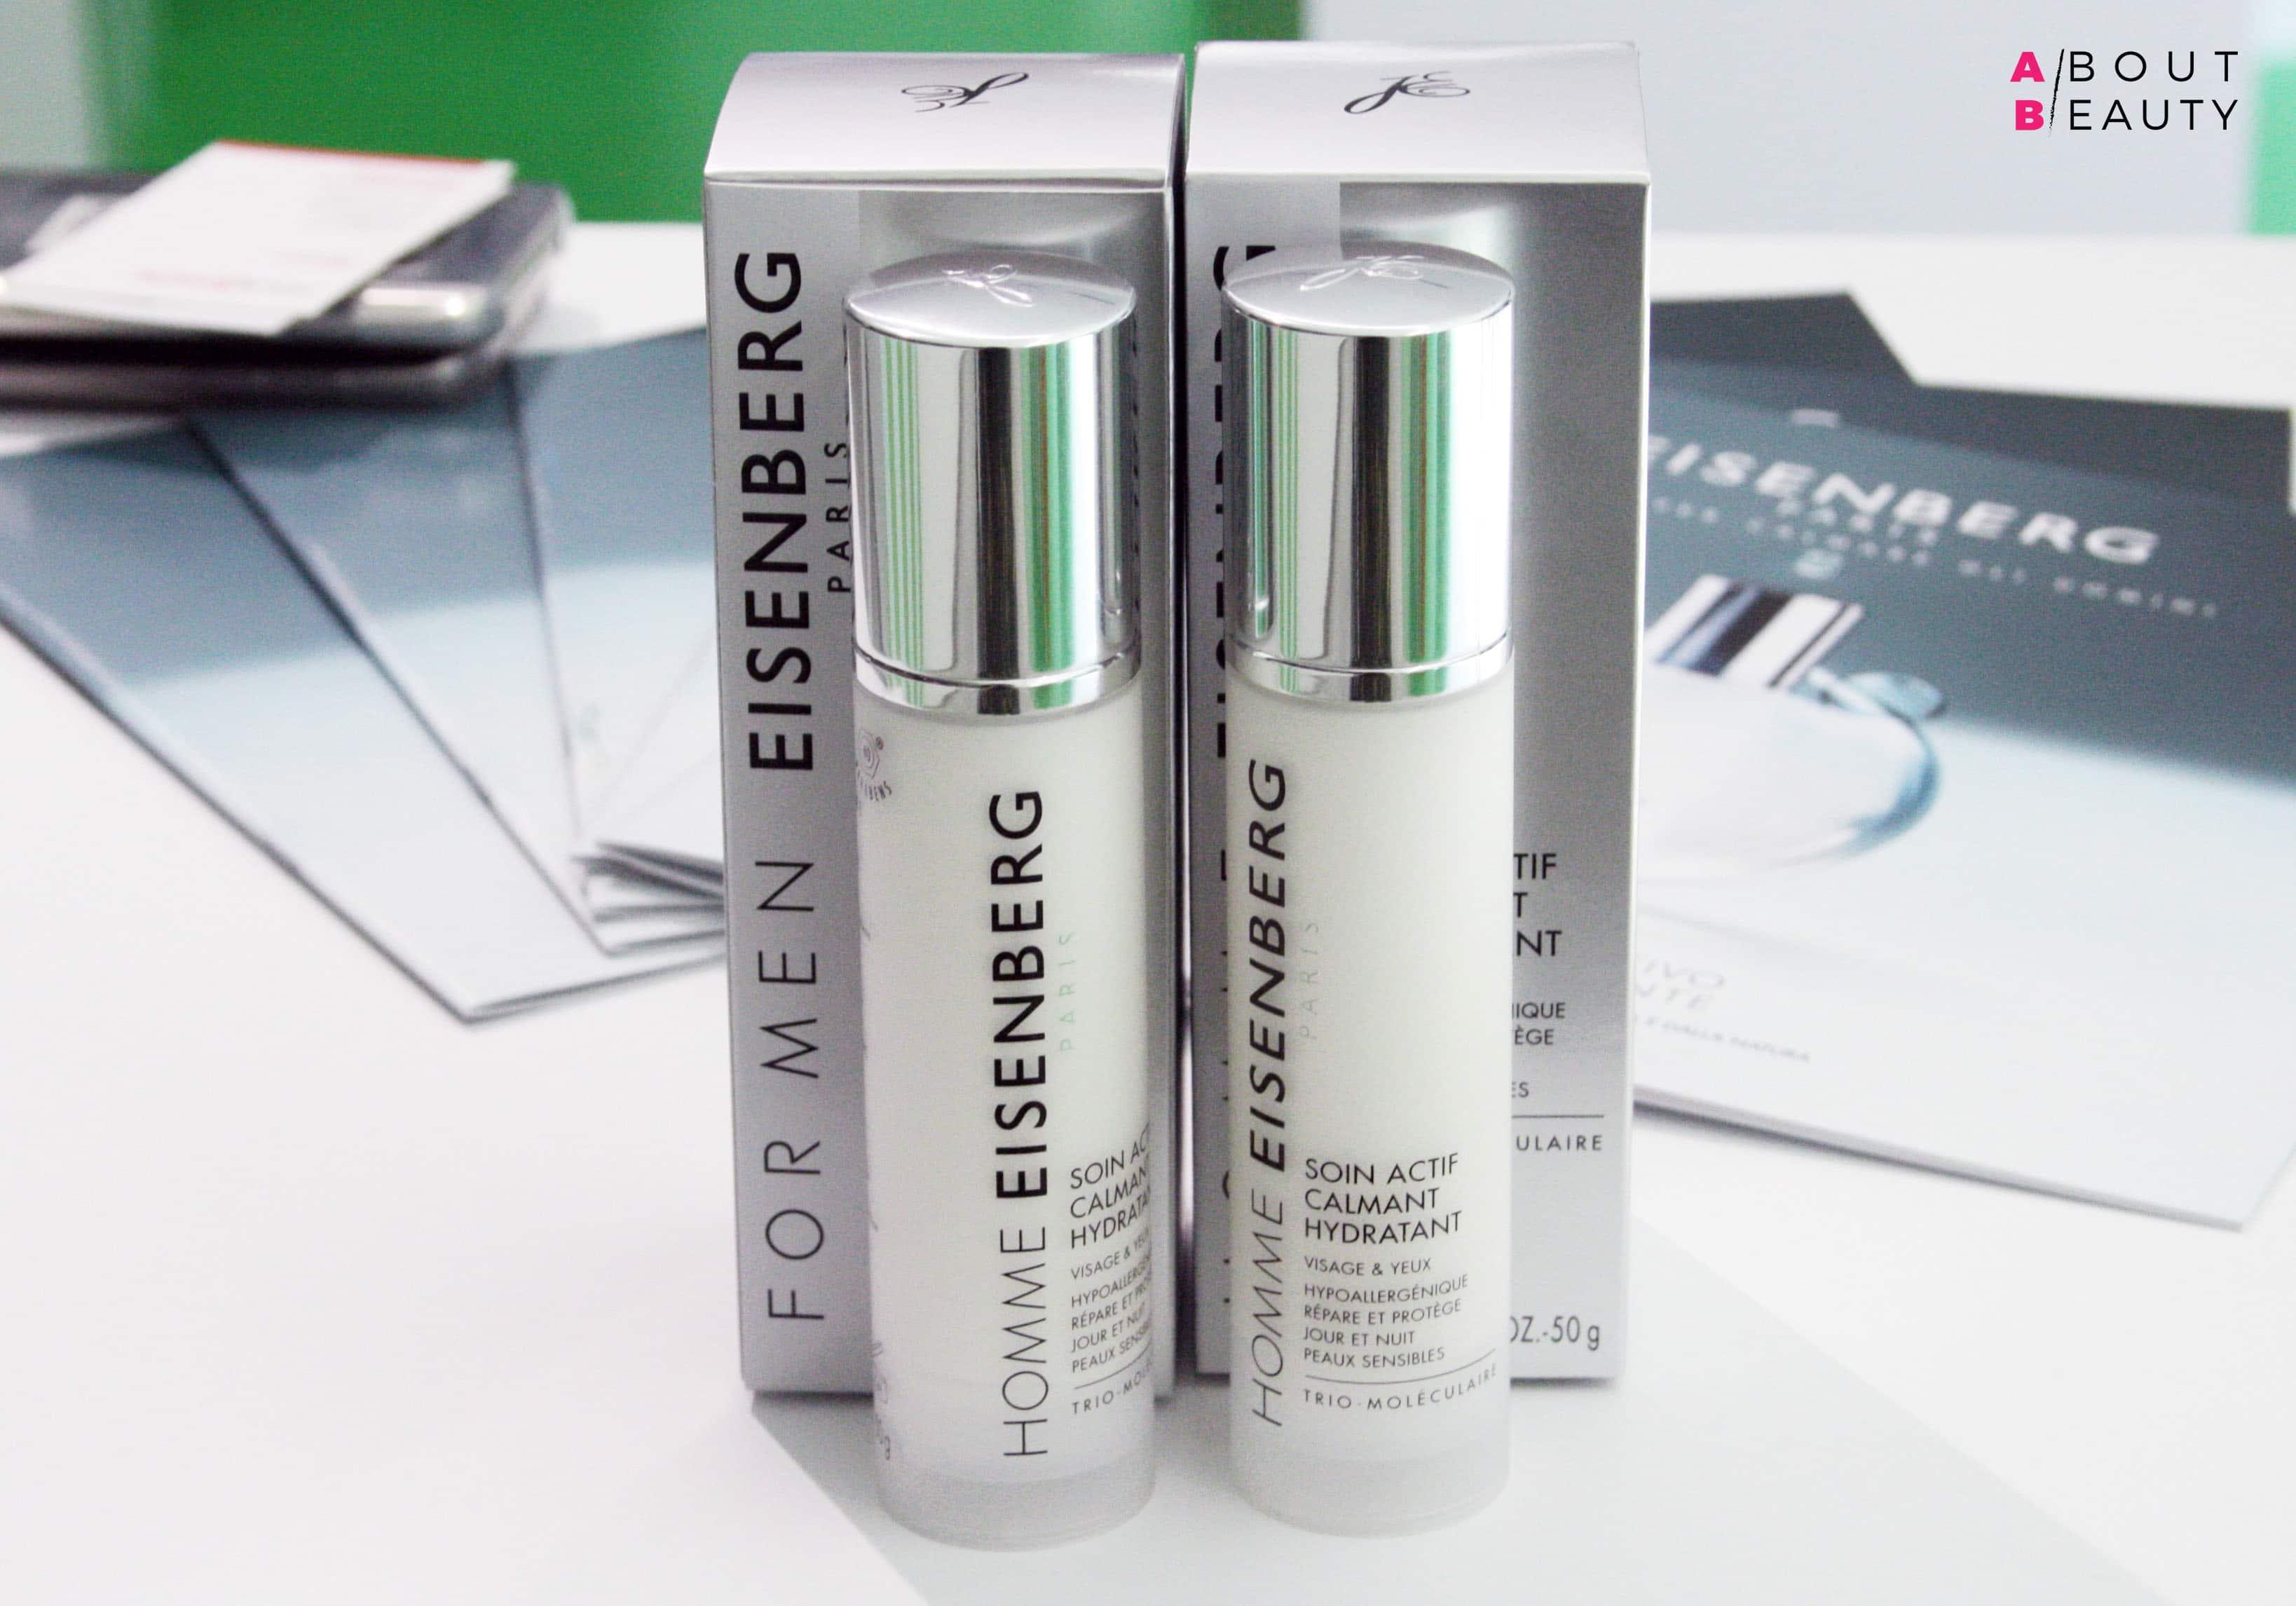 Maschere Eisenberg, sei prodotti per sei diverse esigenze - Info, foto, prezzi